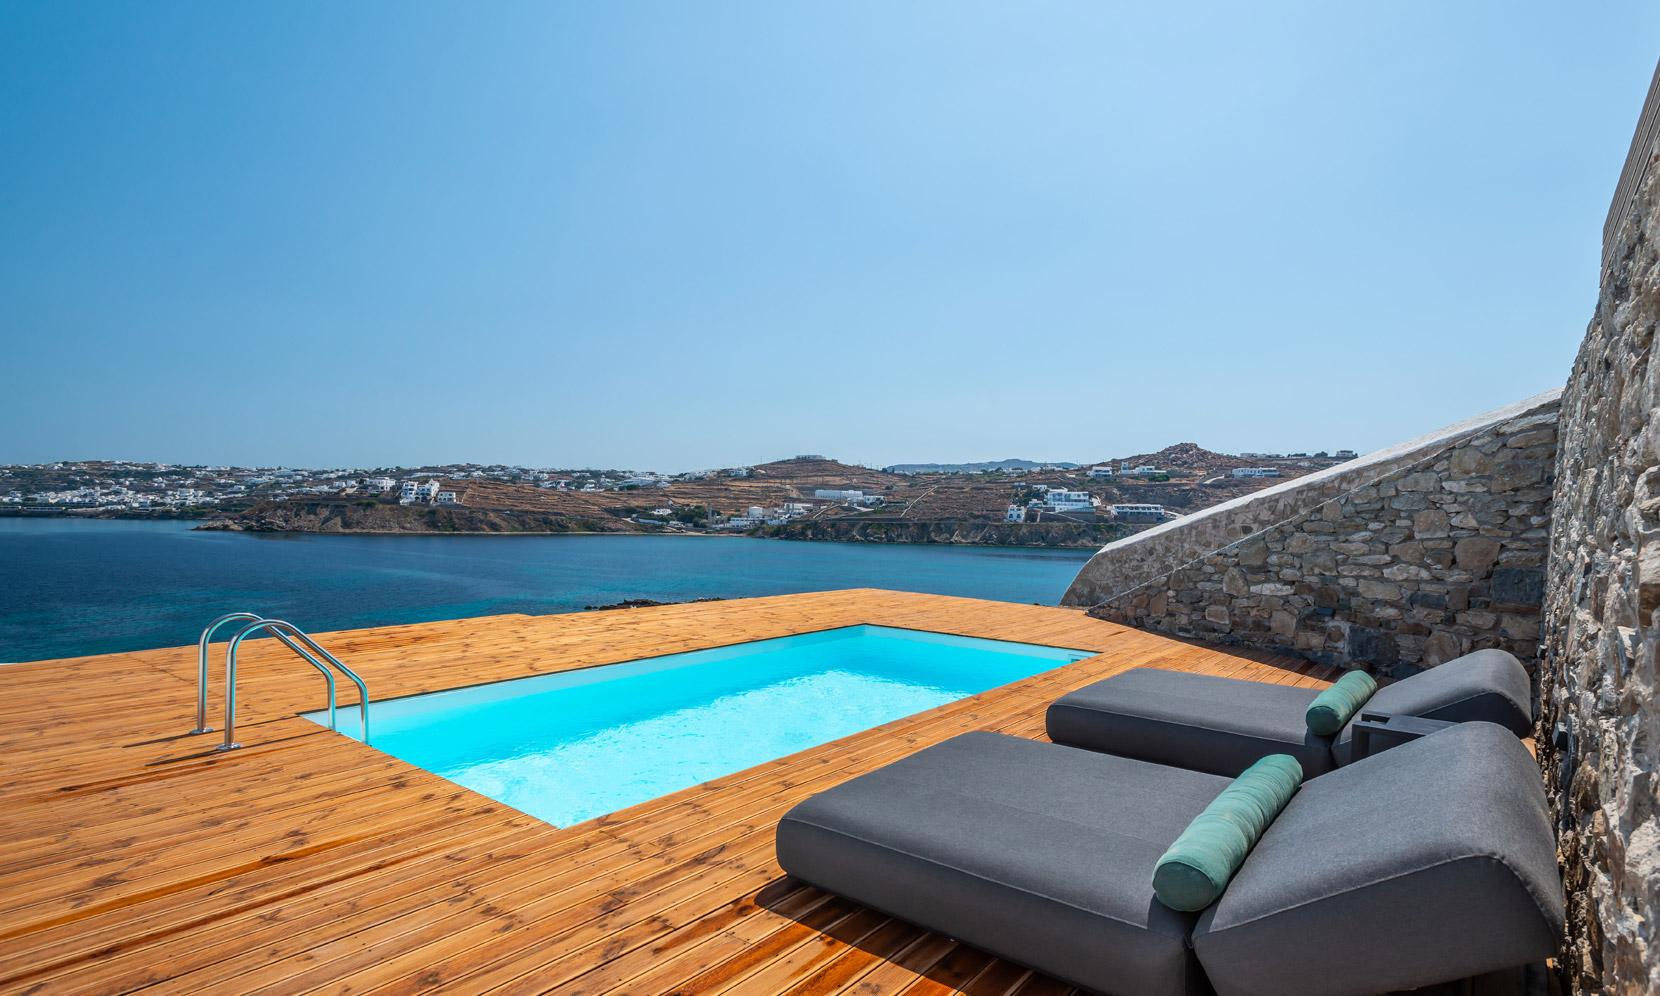 Mykonos Villa Dream 2 jumbotron image